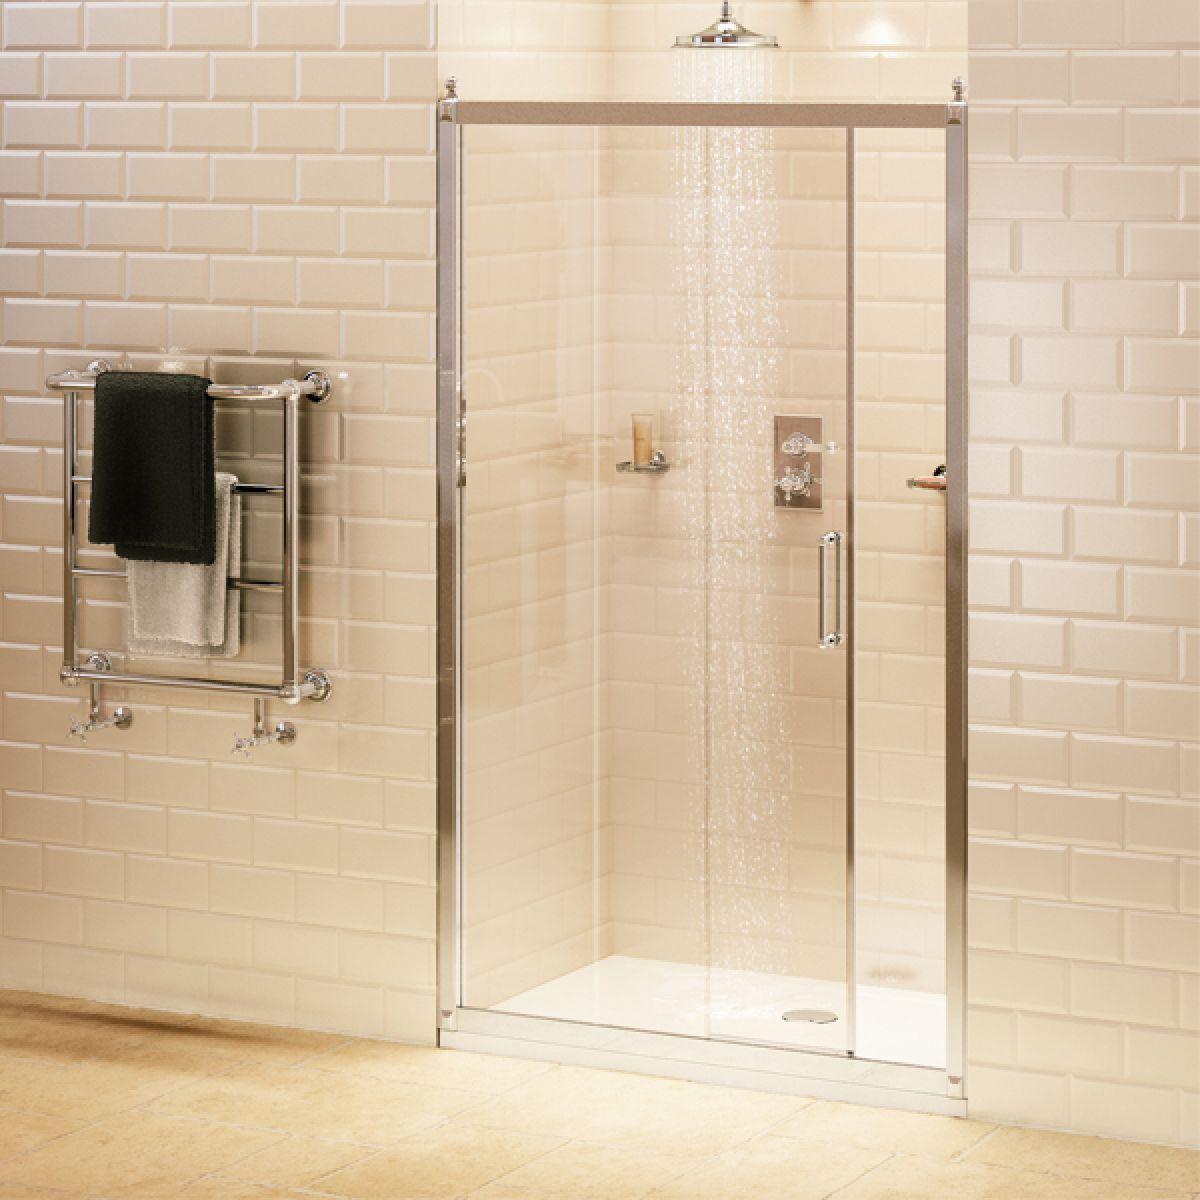 Burlington Sliding Door Shower Enclosure with Optional Inline Panel and Side Panel